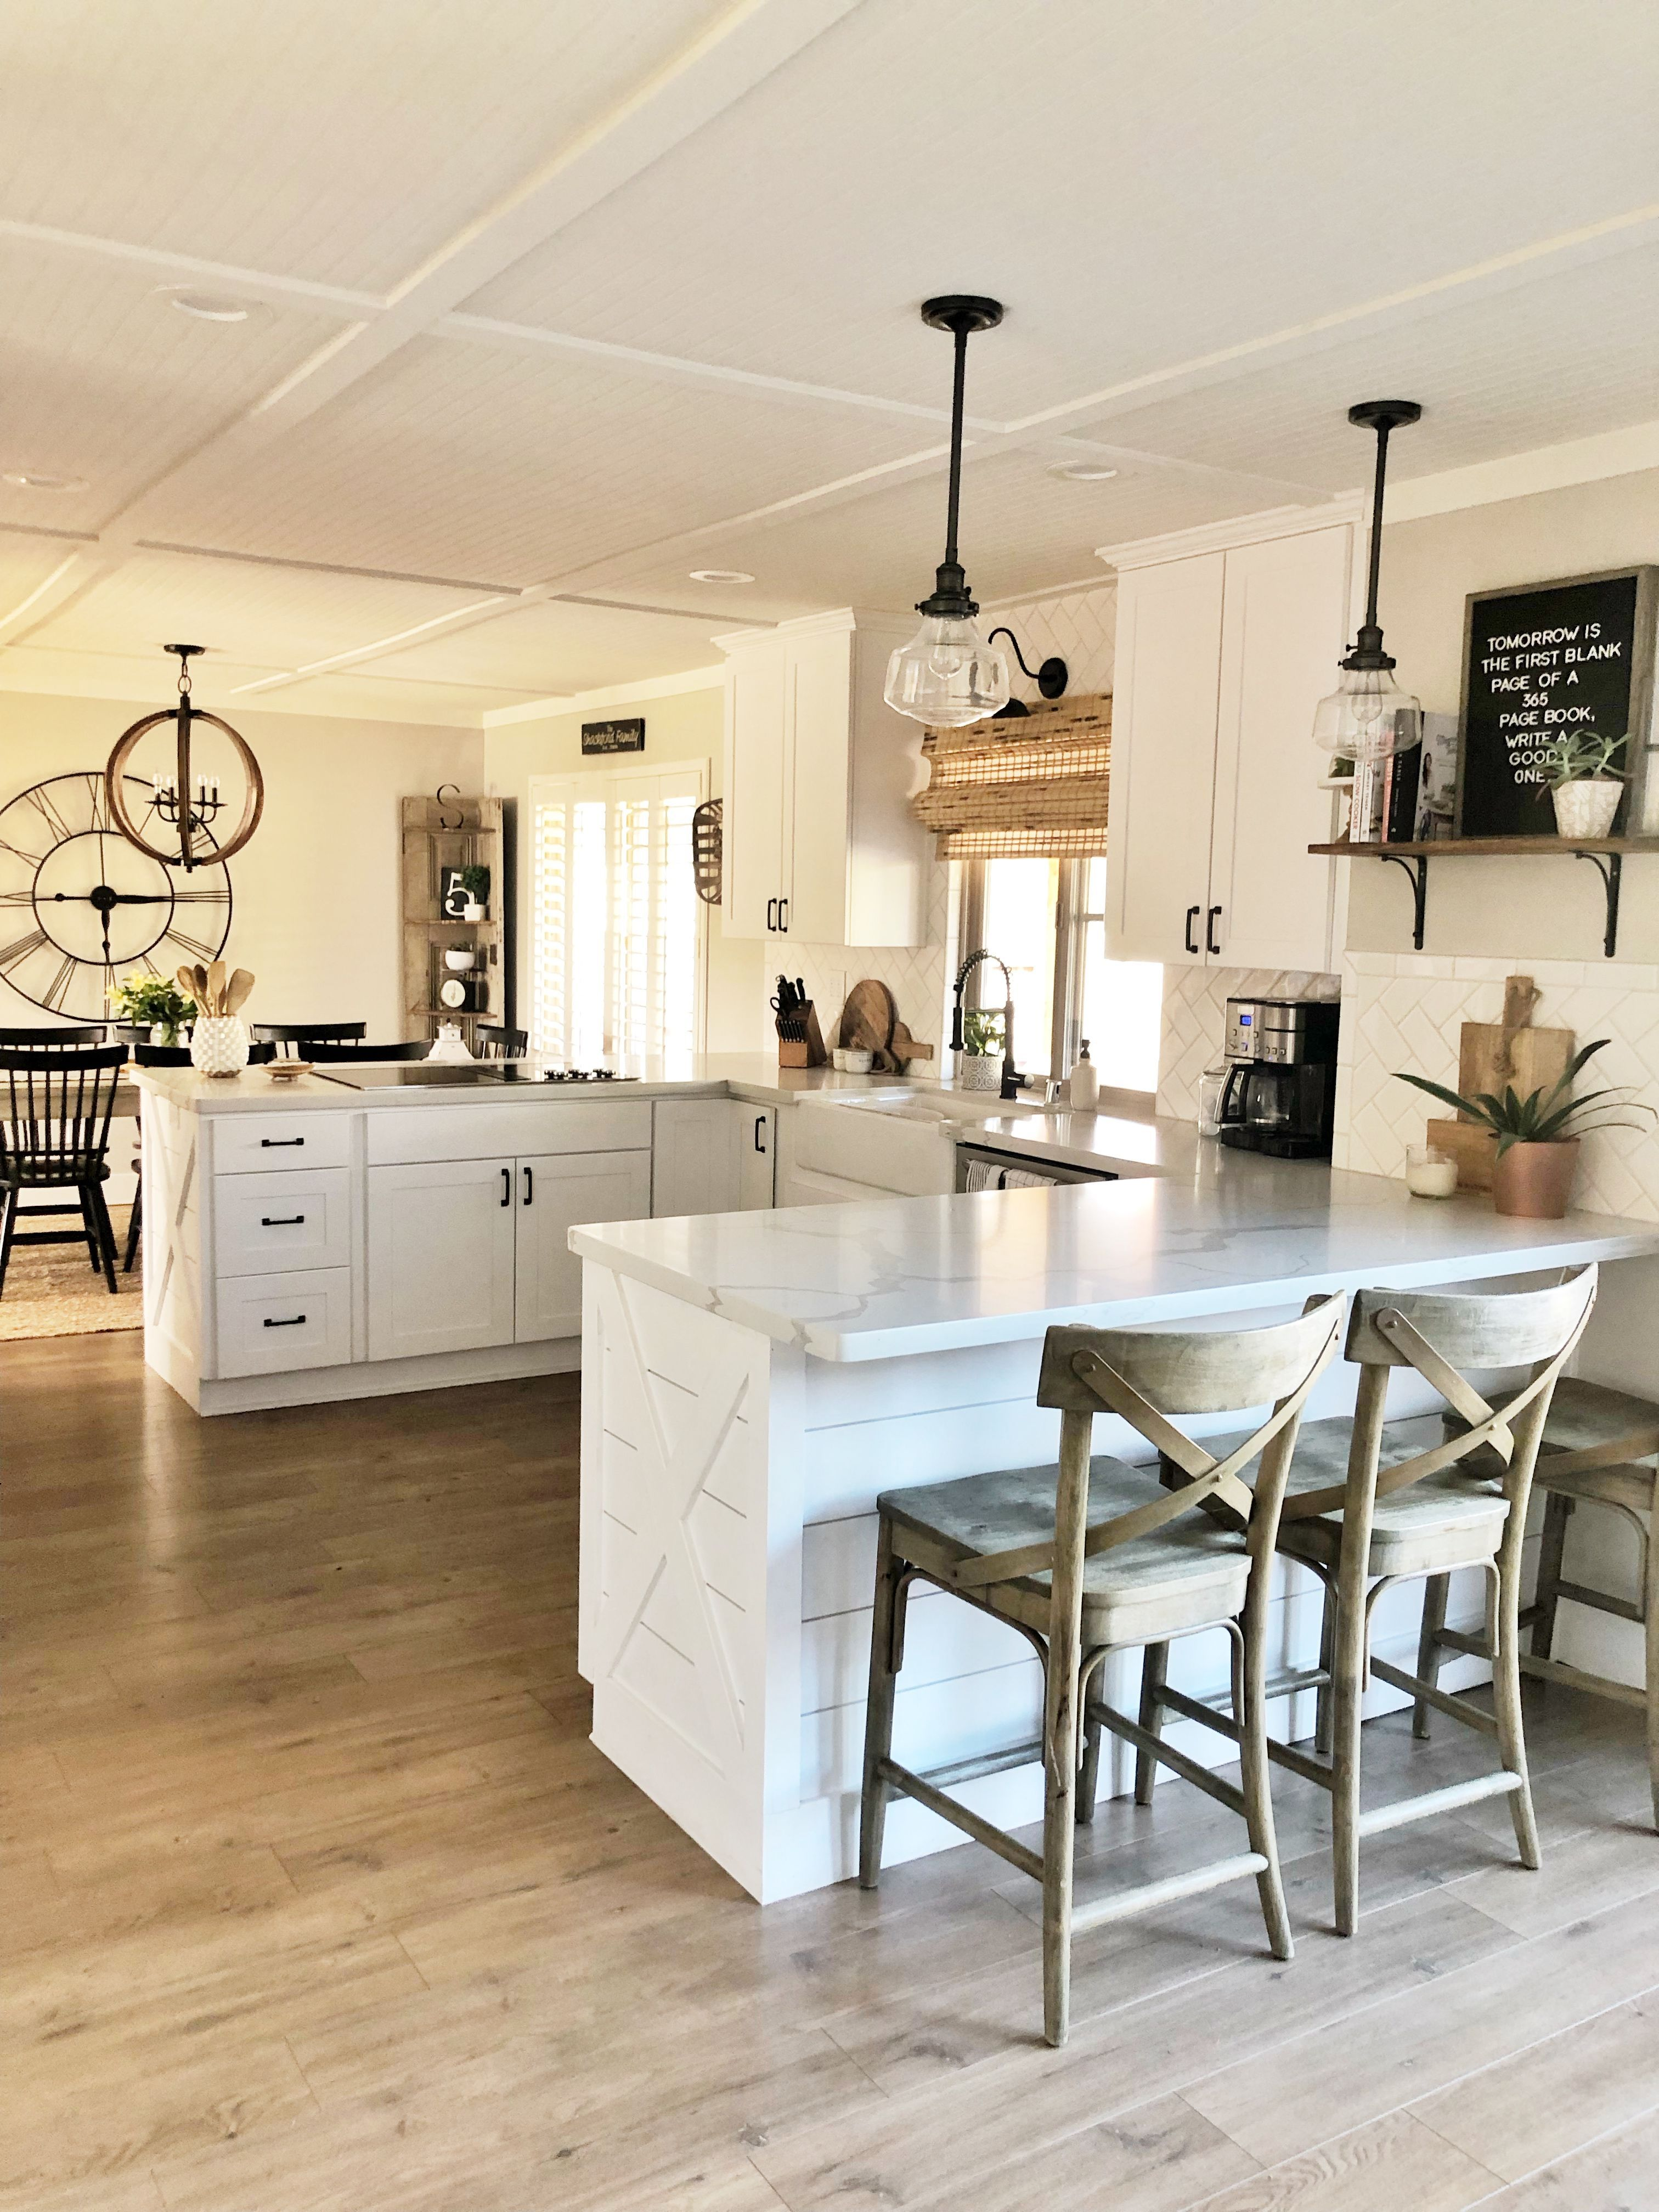 u shape kitchen with farmhouse style kitchen remodel small kitchen design small white on u kitchen remodel id=96649